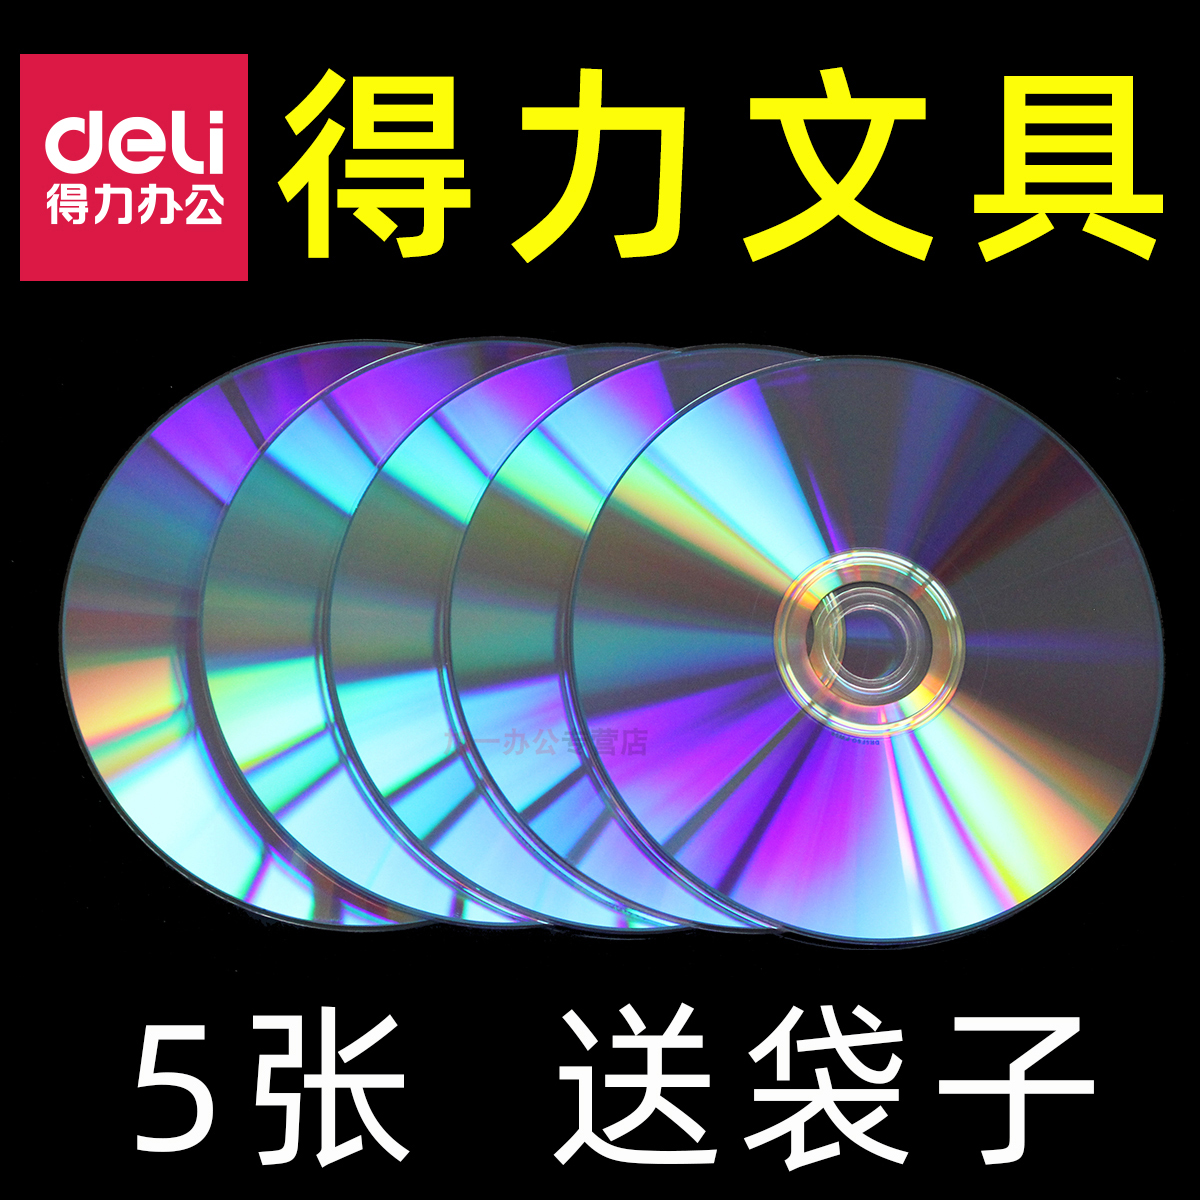 容量 dvd